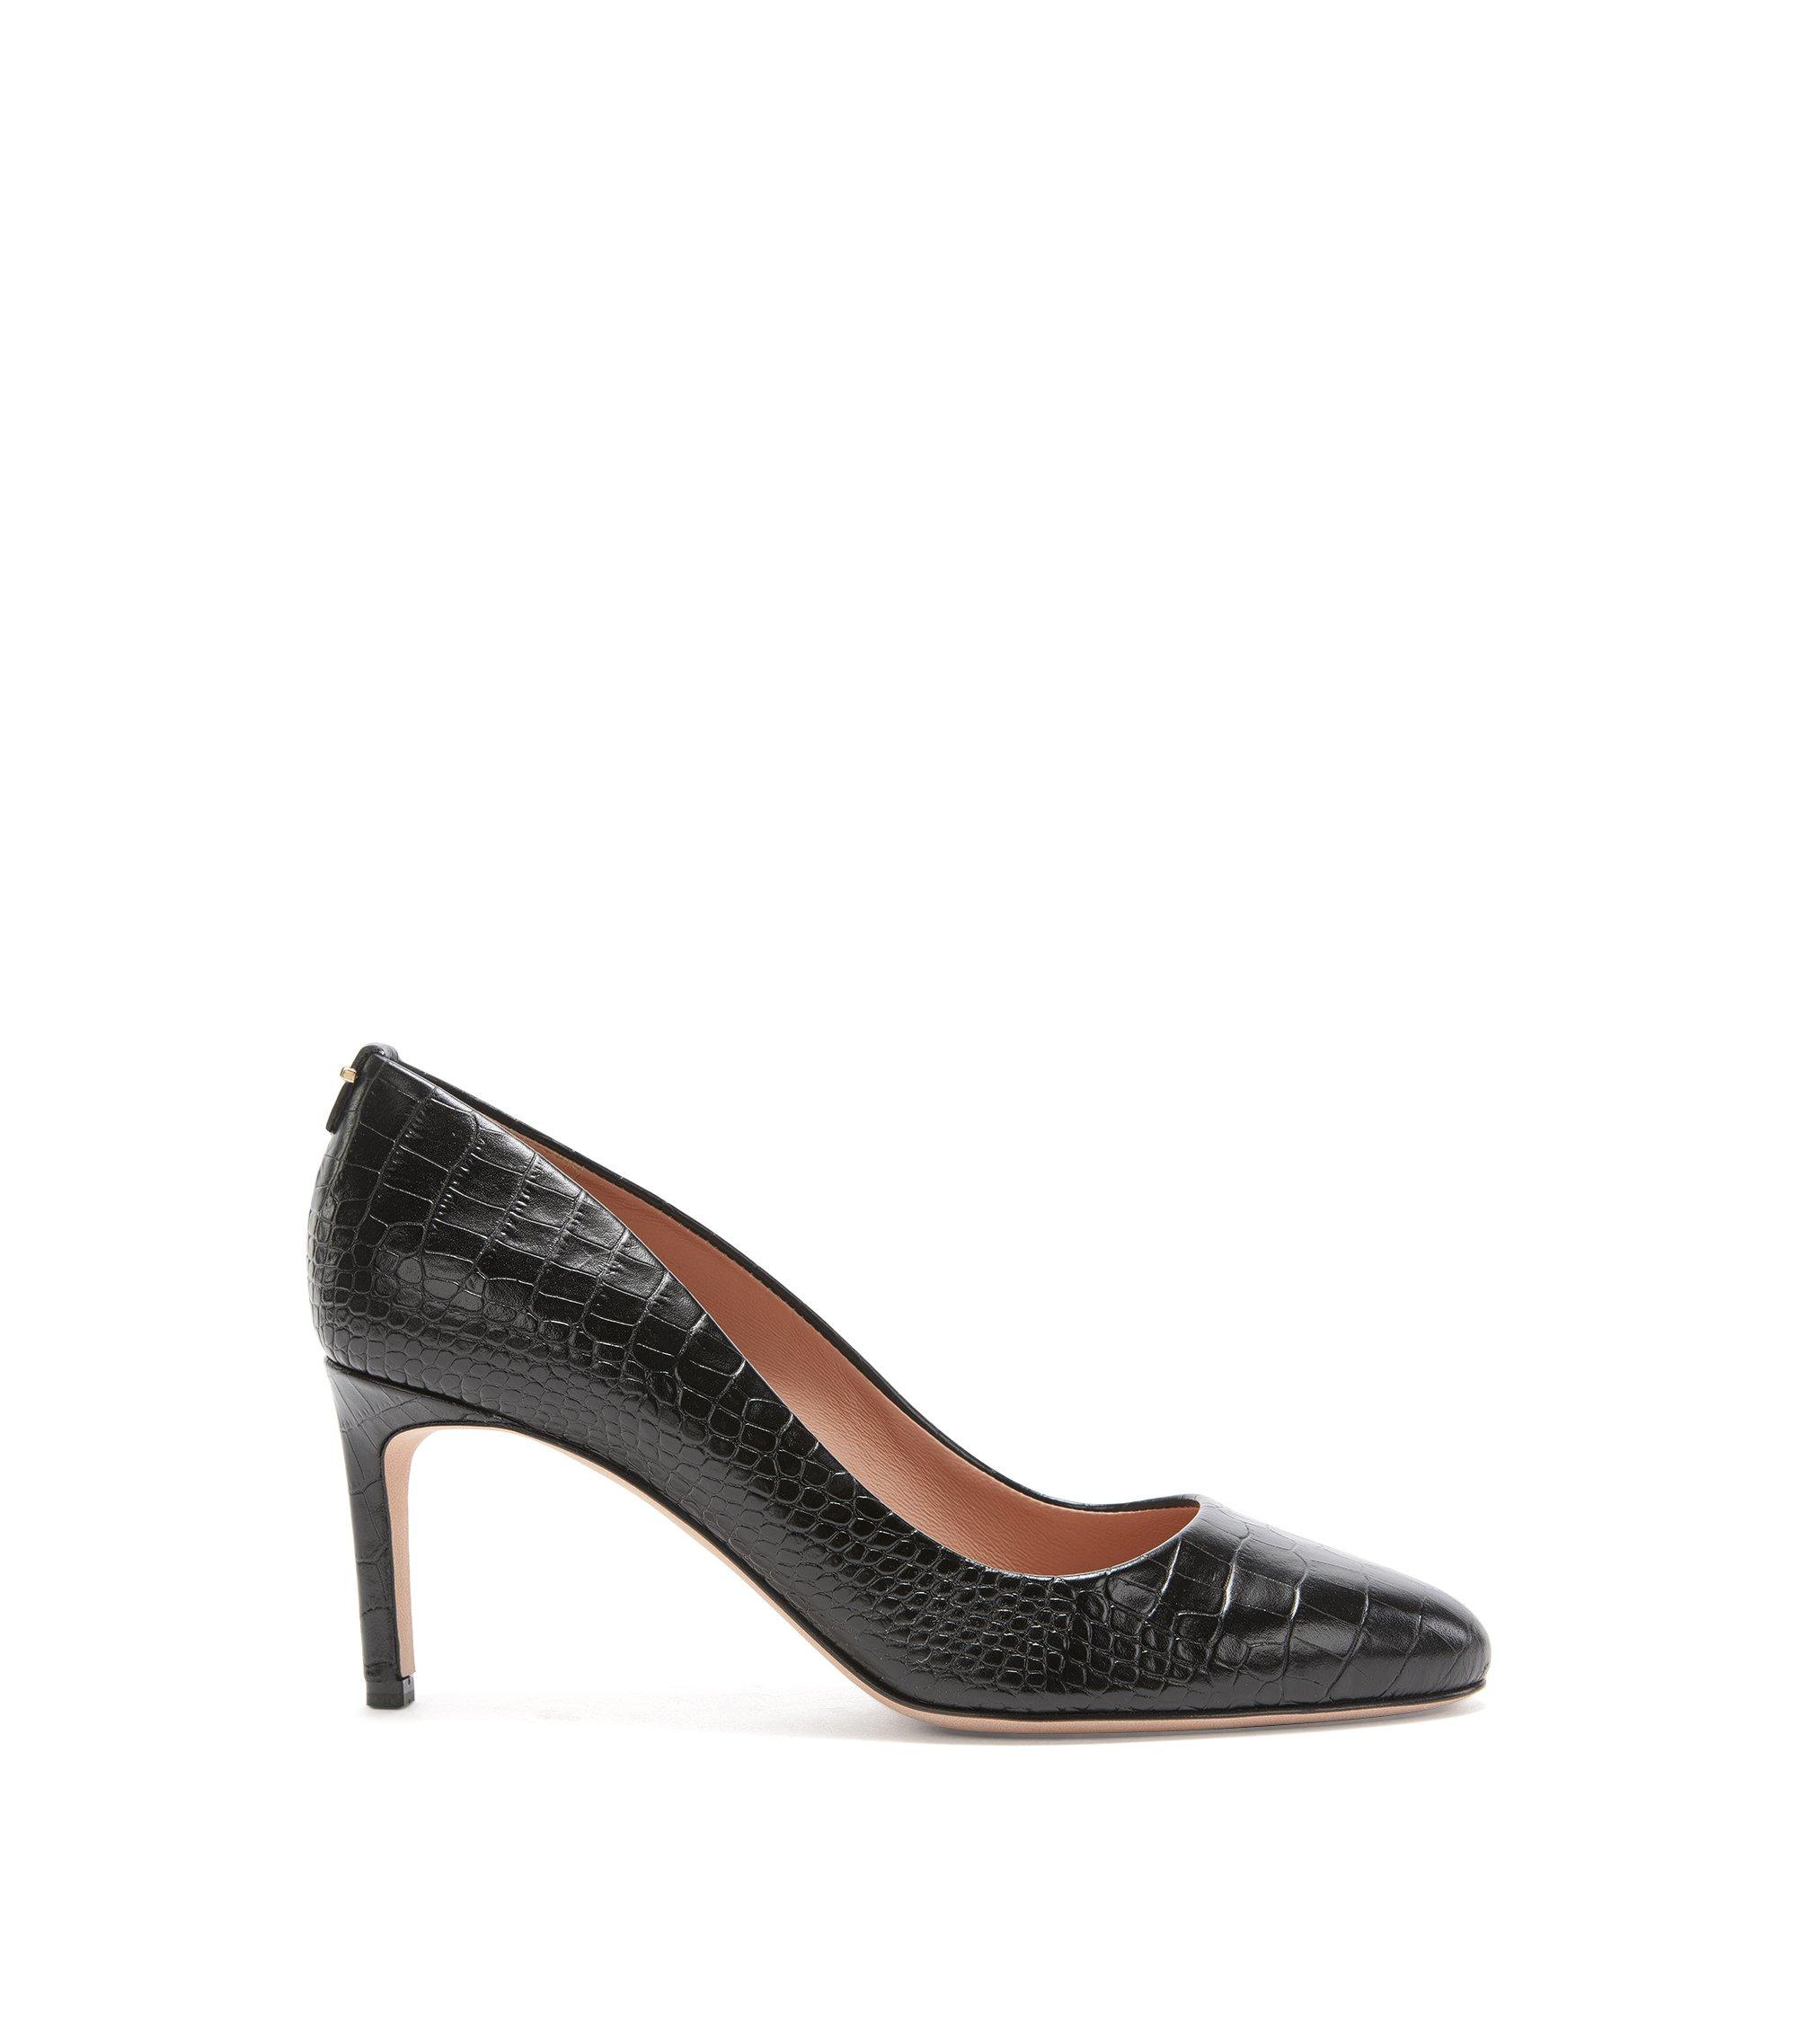 Zapatos de salón de BOSS Luxury Staple en piel italiana , Negro